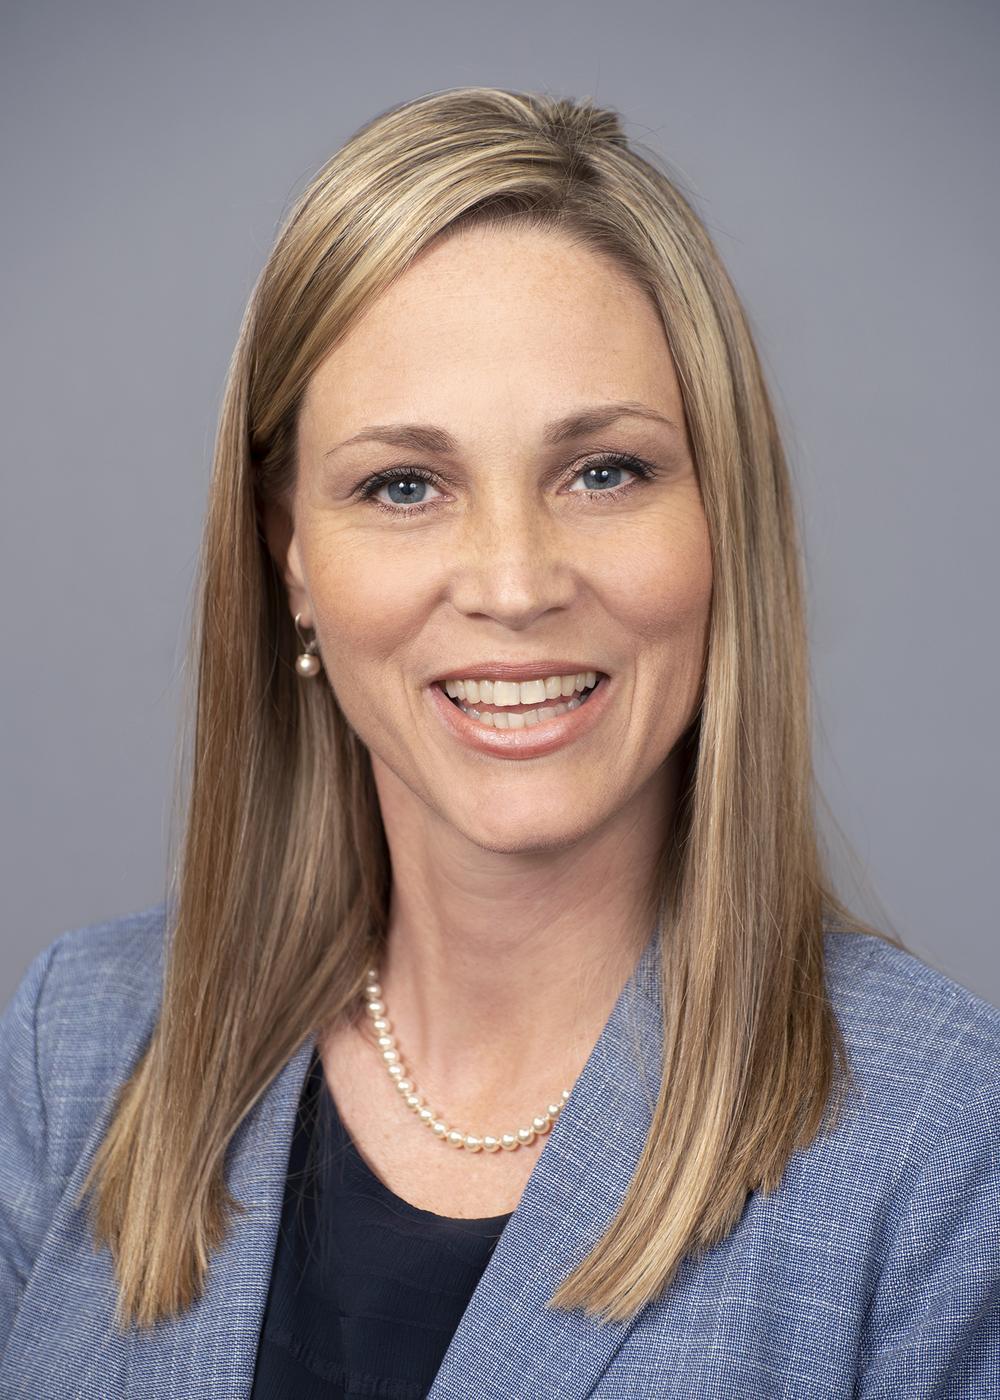 Amy J. Slade